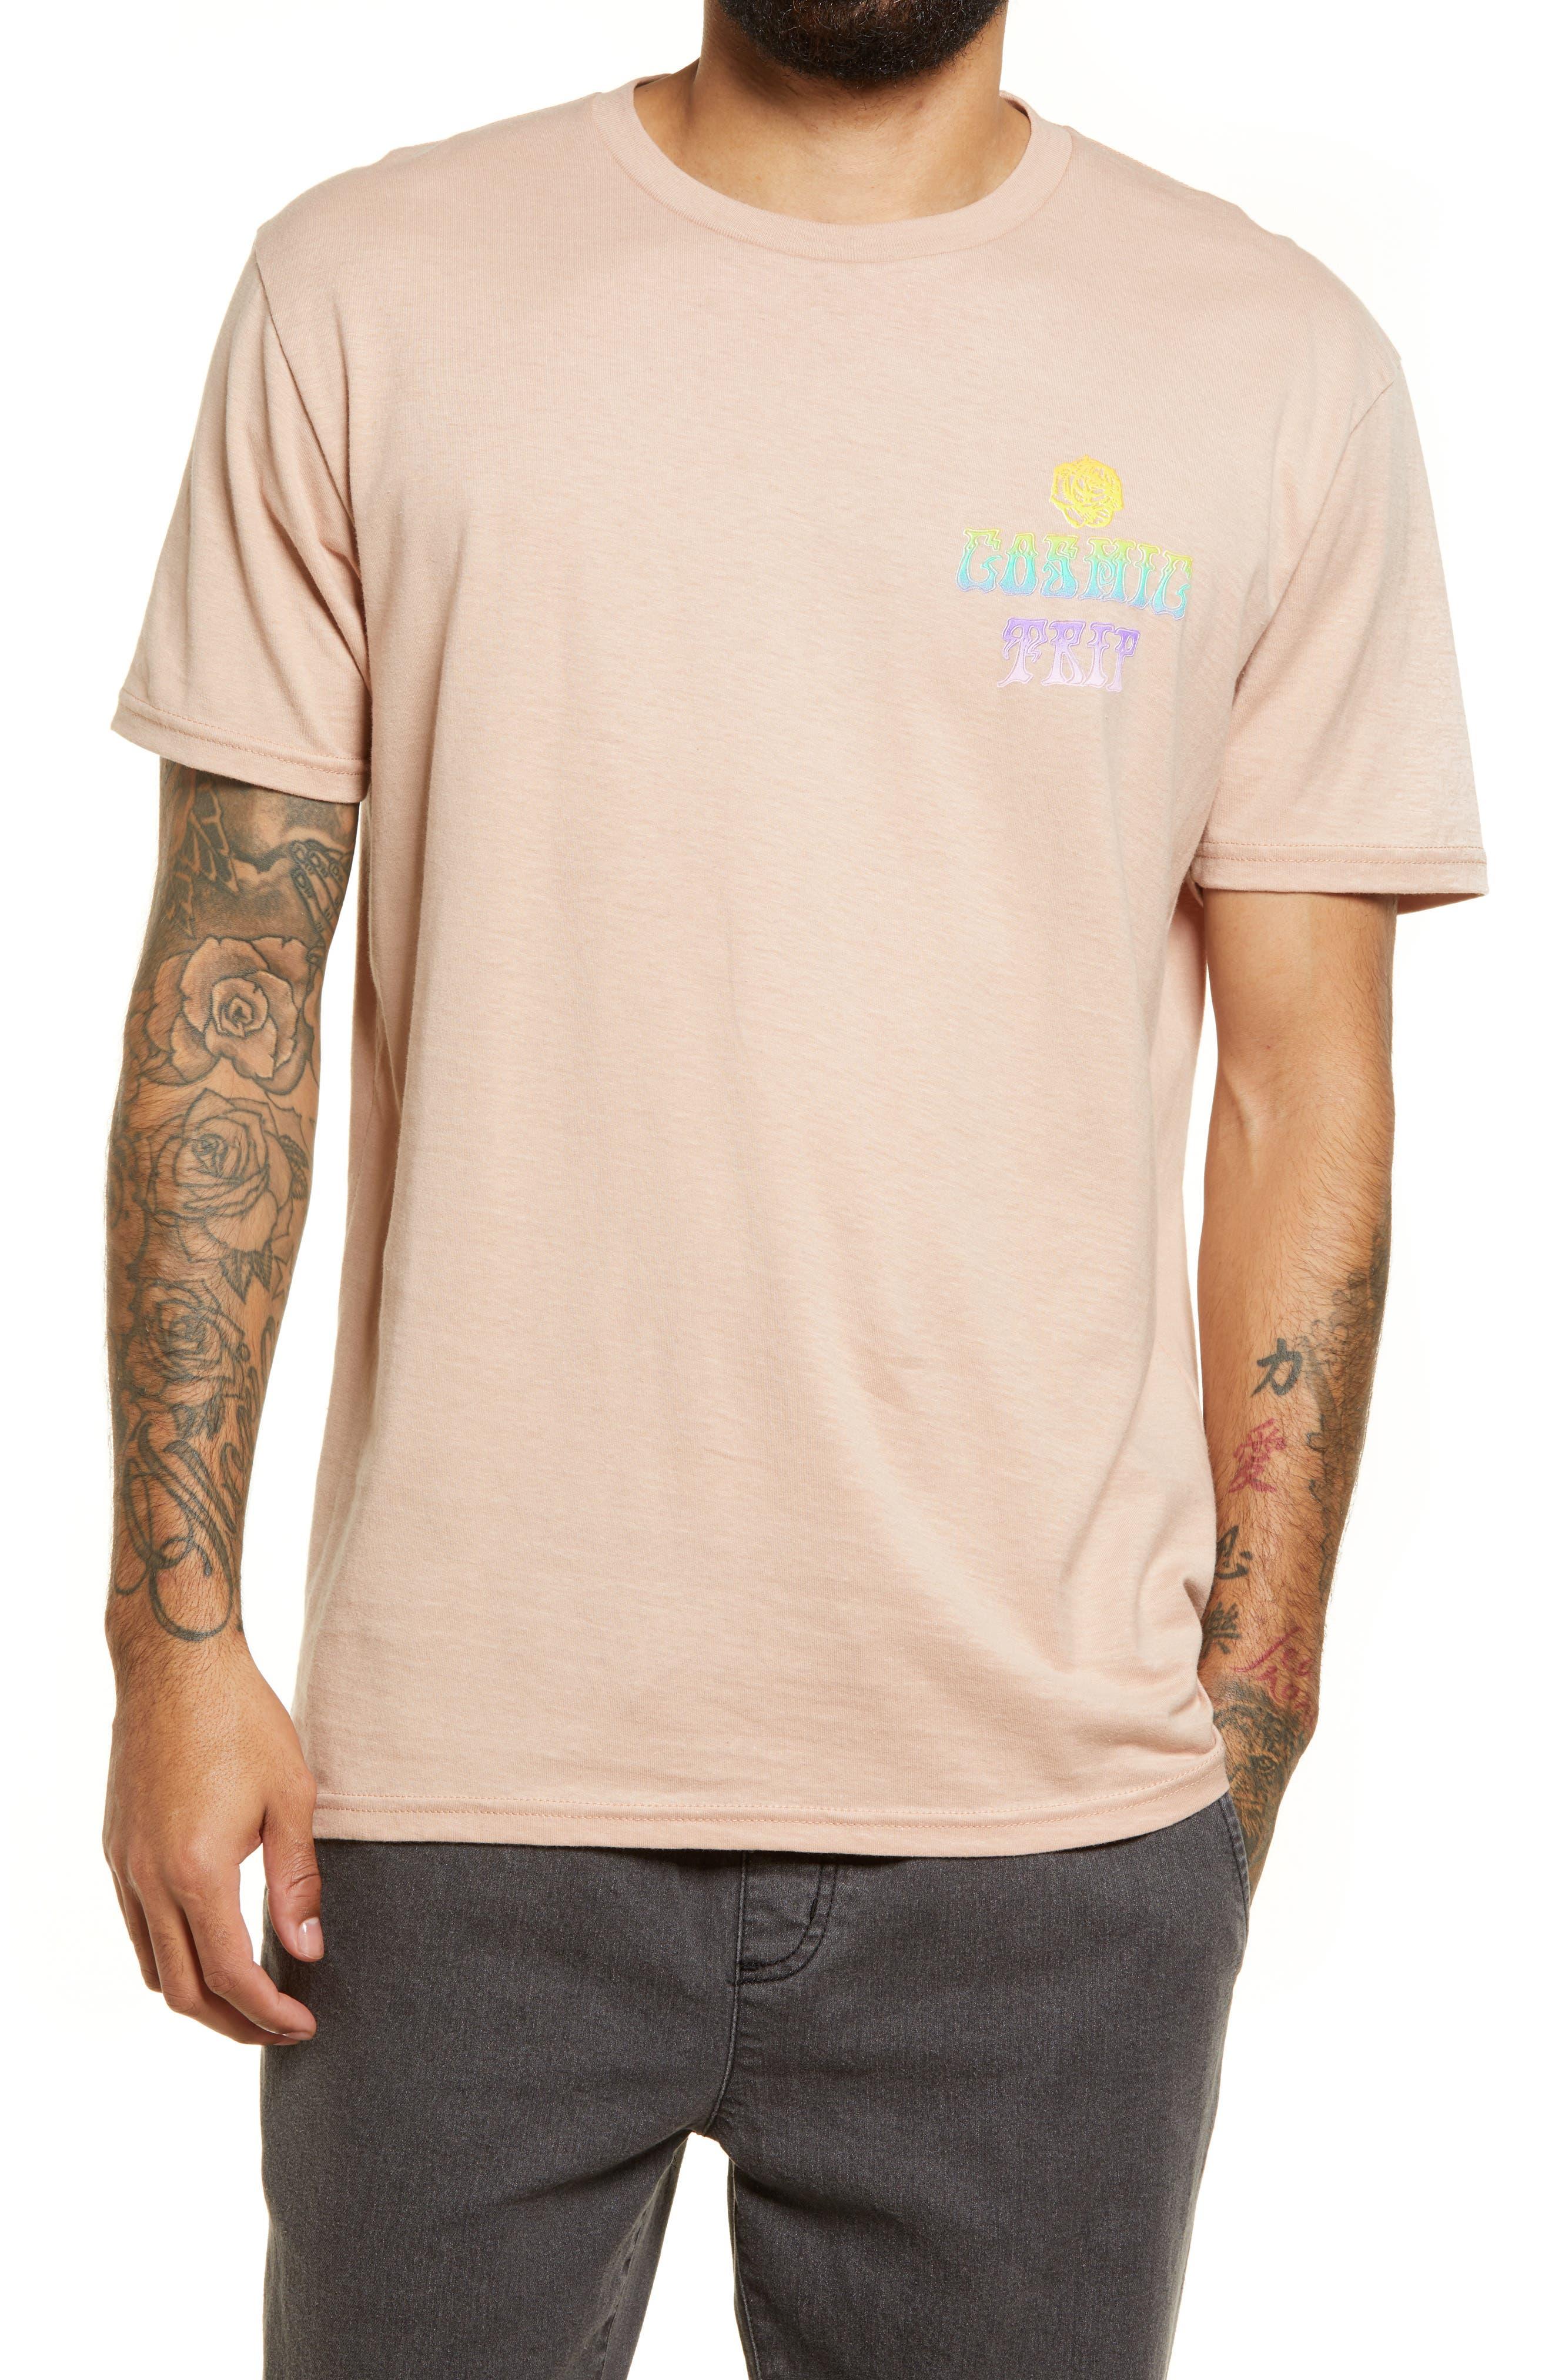 Lira Clothing Men's Lira Clothing Parnell Graphic Tee, Size Small - Pink